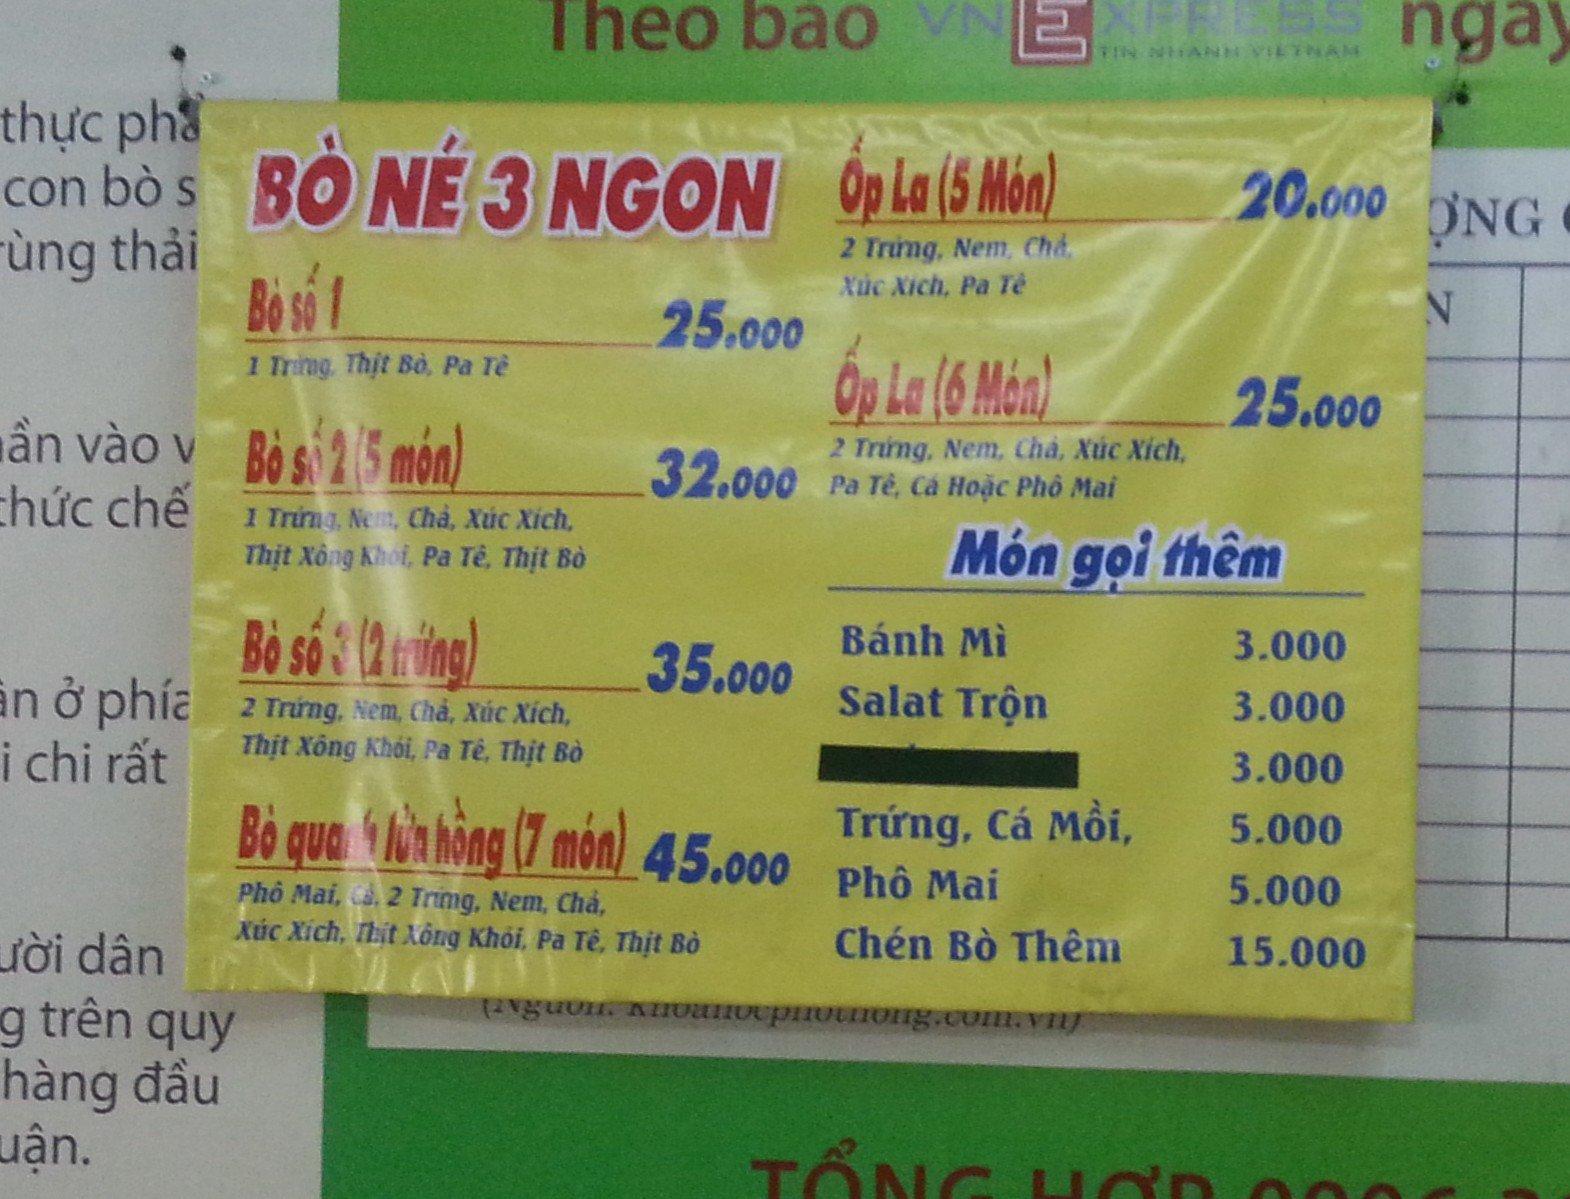 Bo ne 3 ngon is cheap in Vietnam